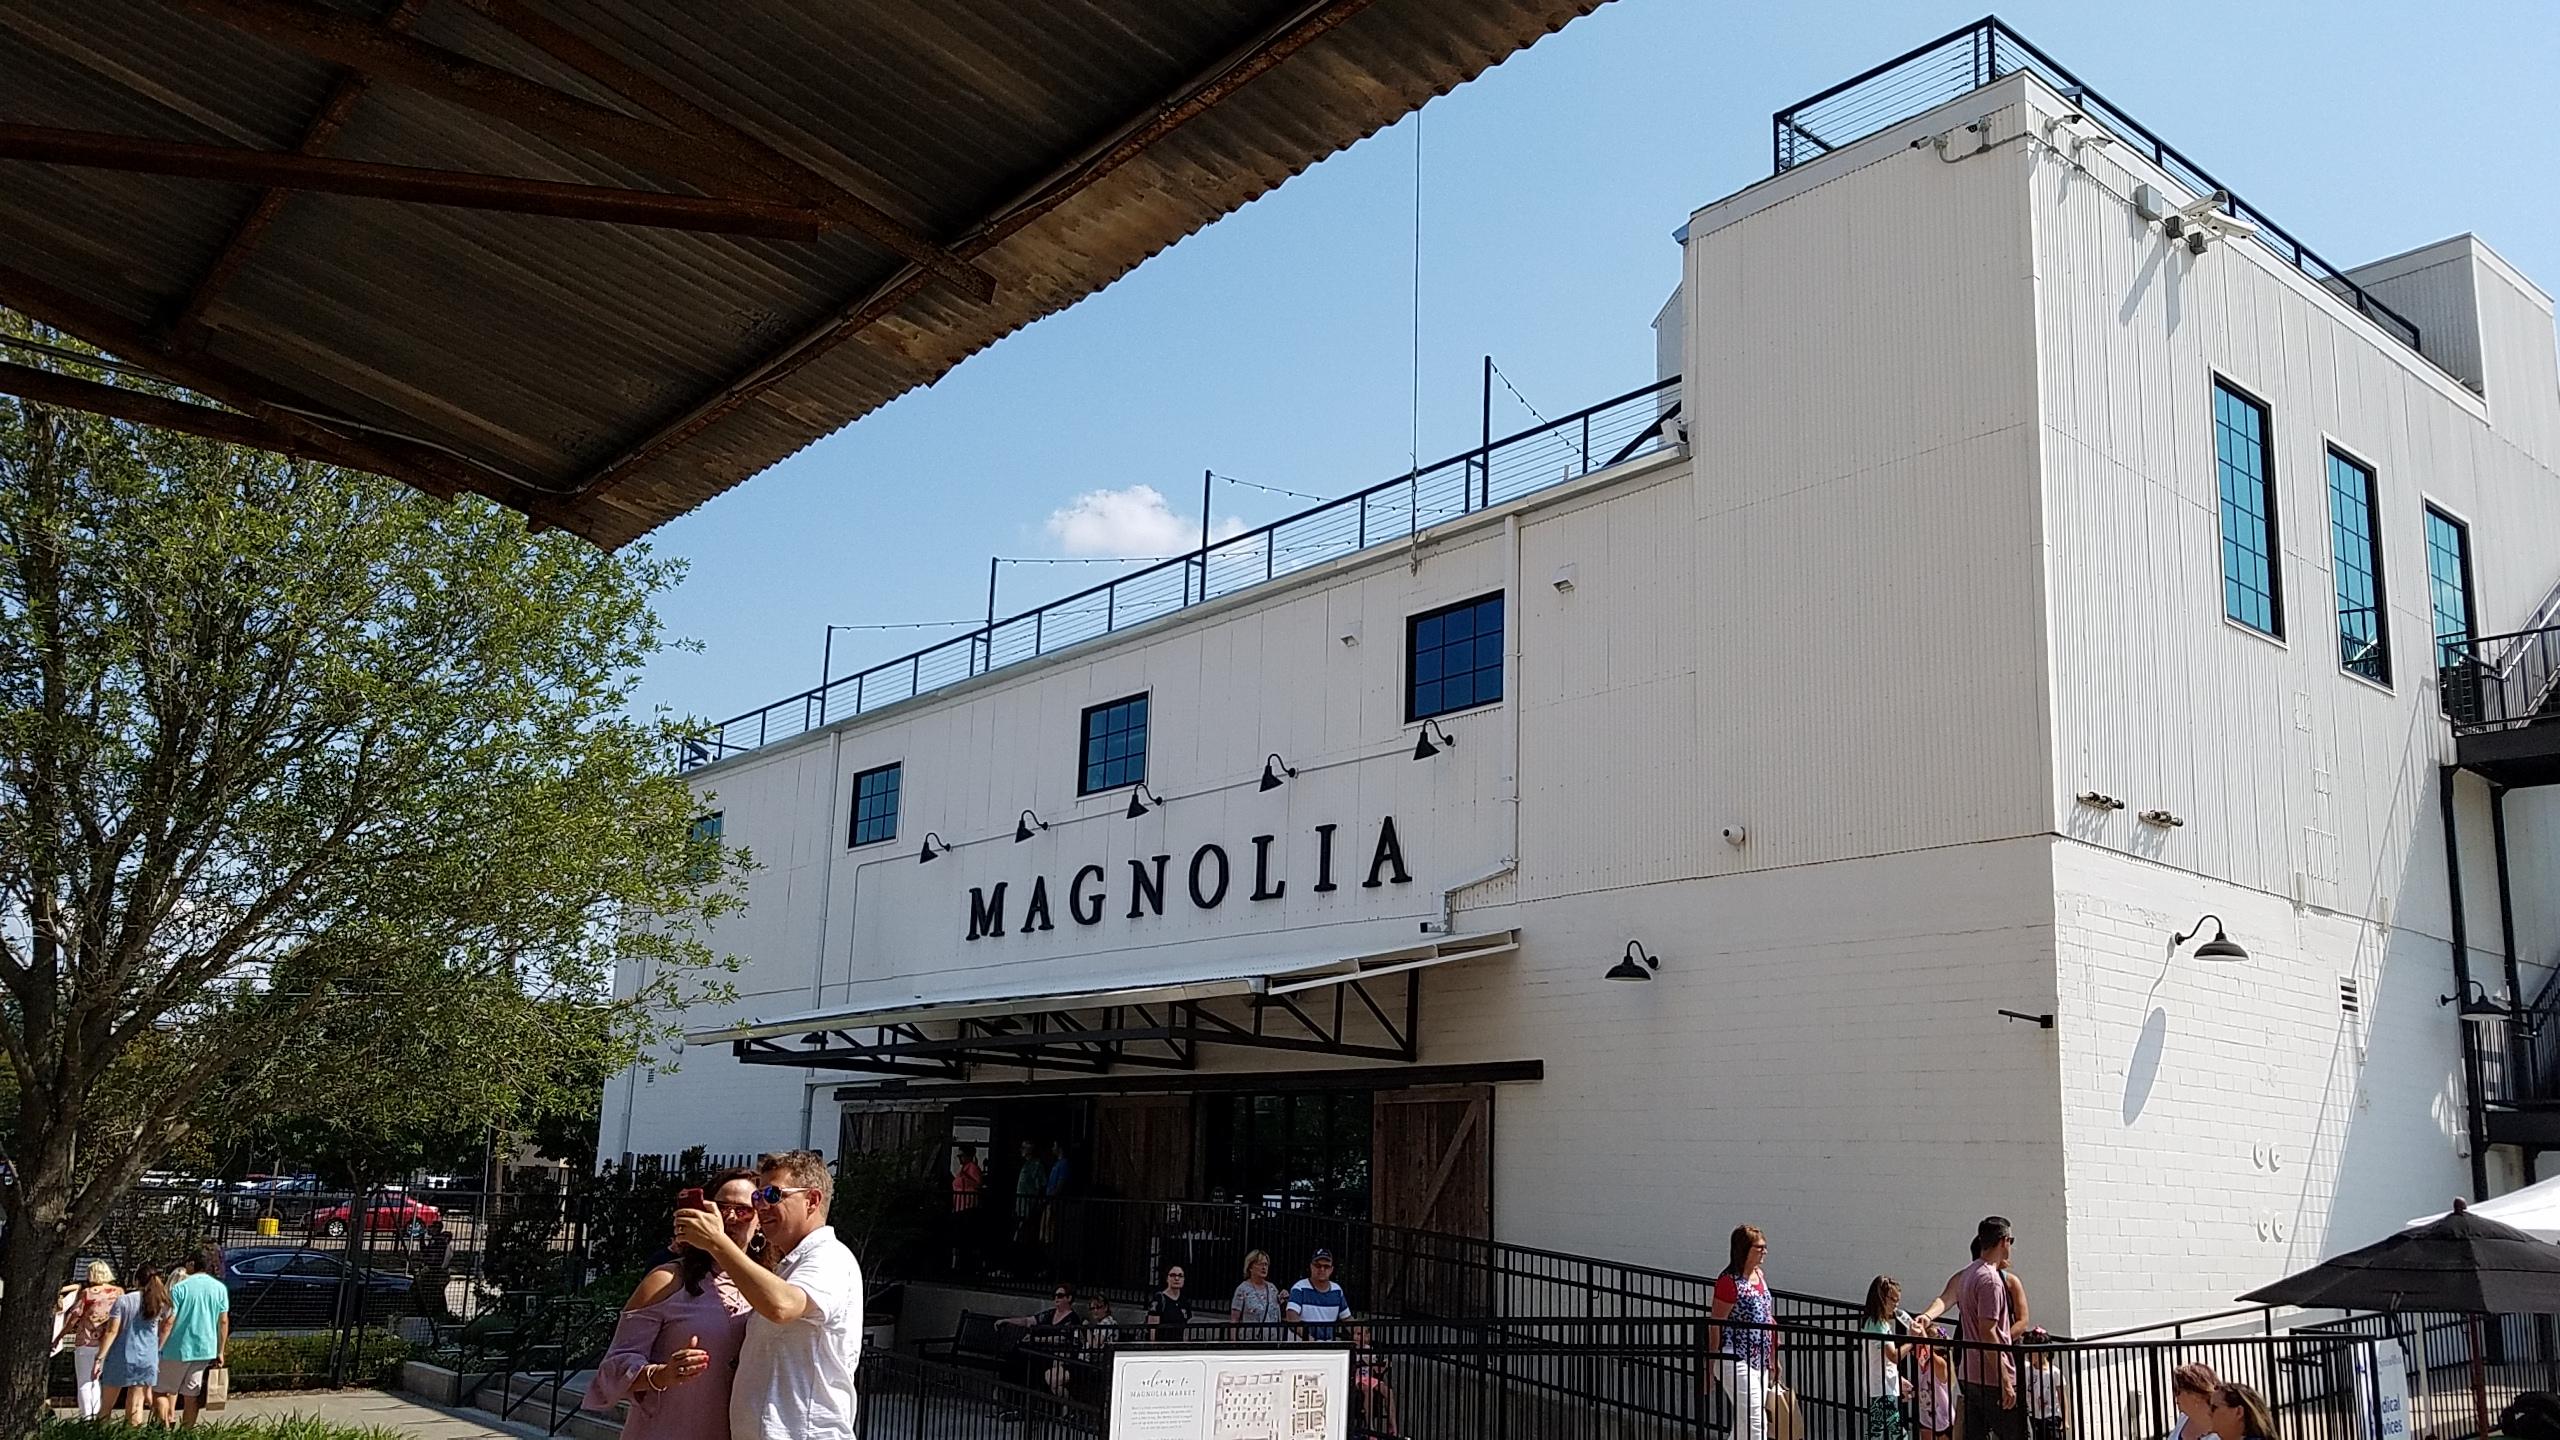 Magnolia Market Wikipedia,Thanksgiving Side Dishes